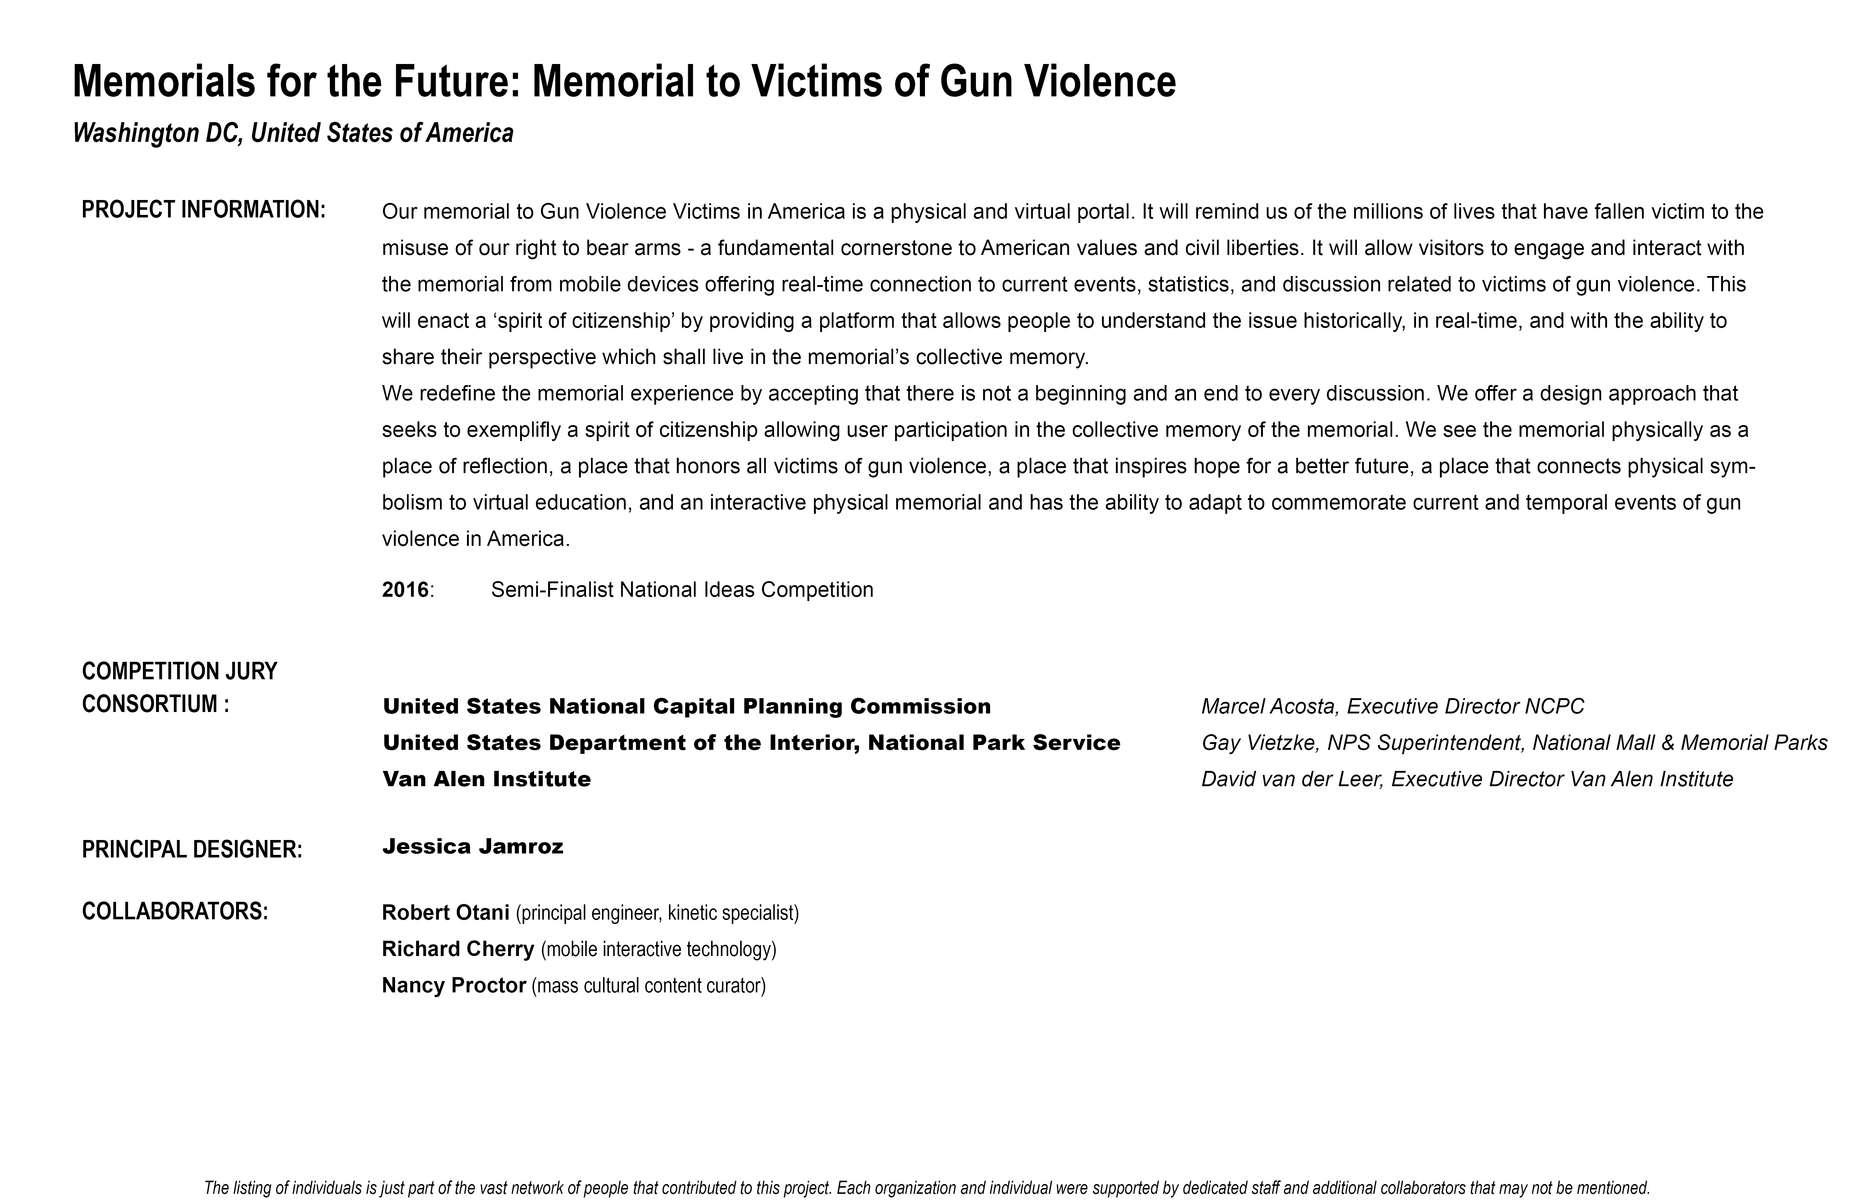 Project-Credits-Memorial-to-victims-of-gun-violence